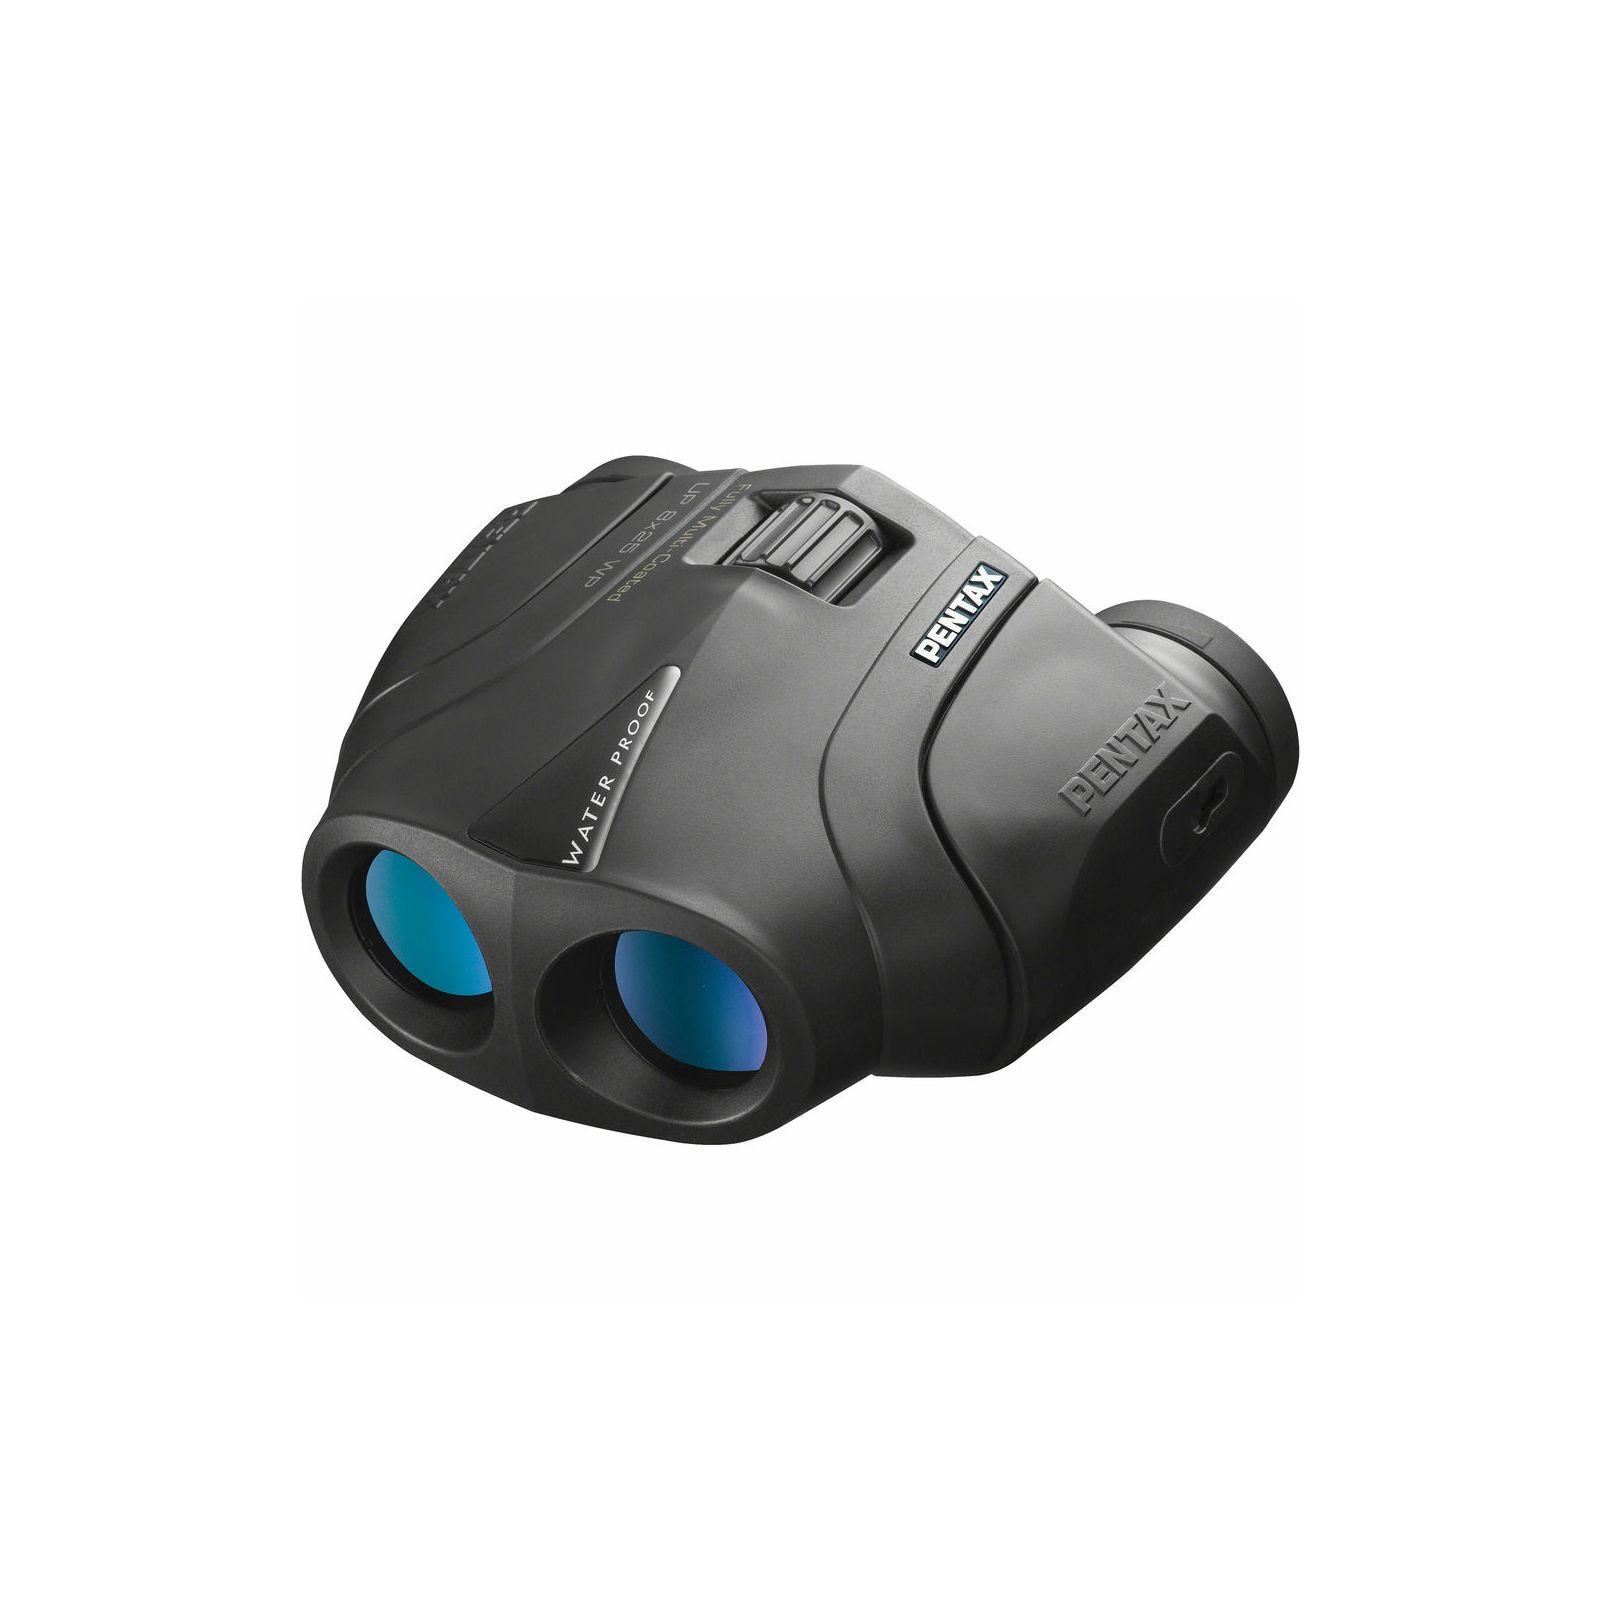 Pentax UP-Utility 8x25 WP U serija dvogled dalekozor binocular